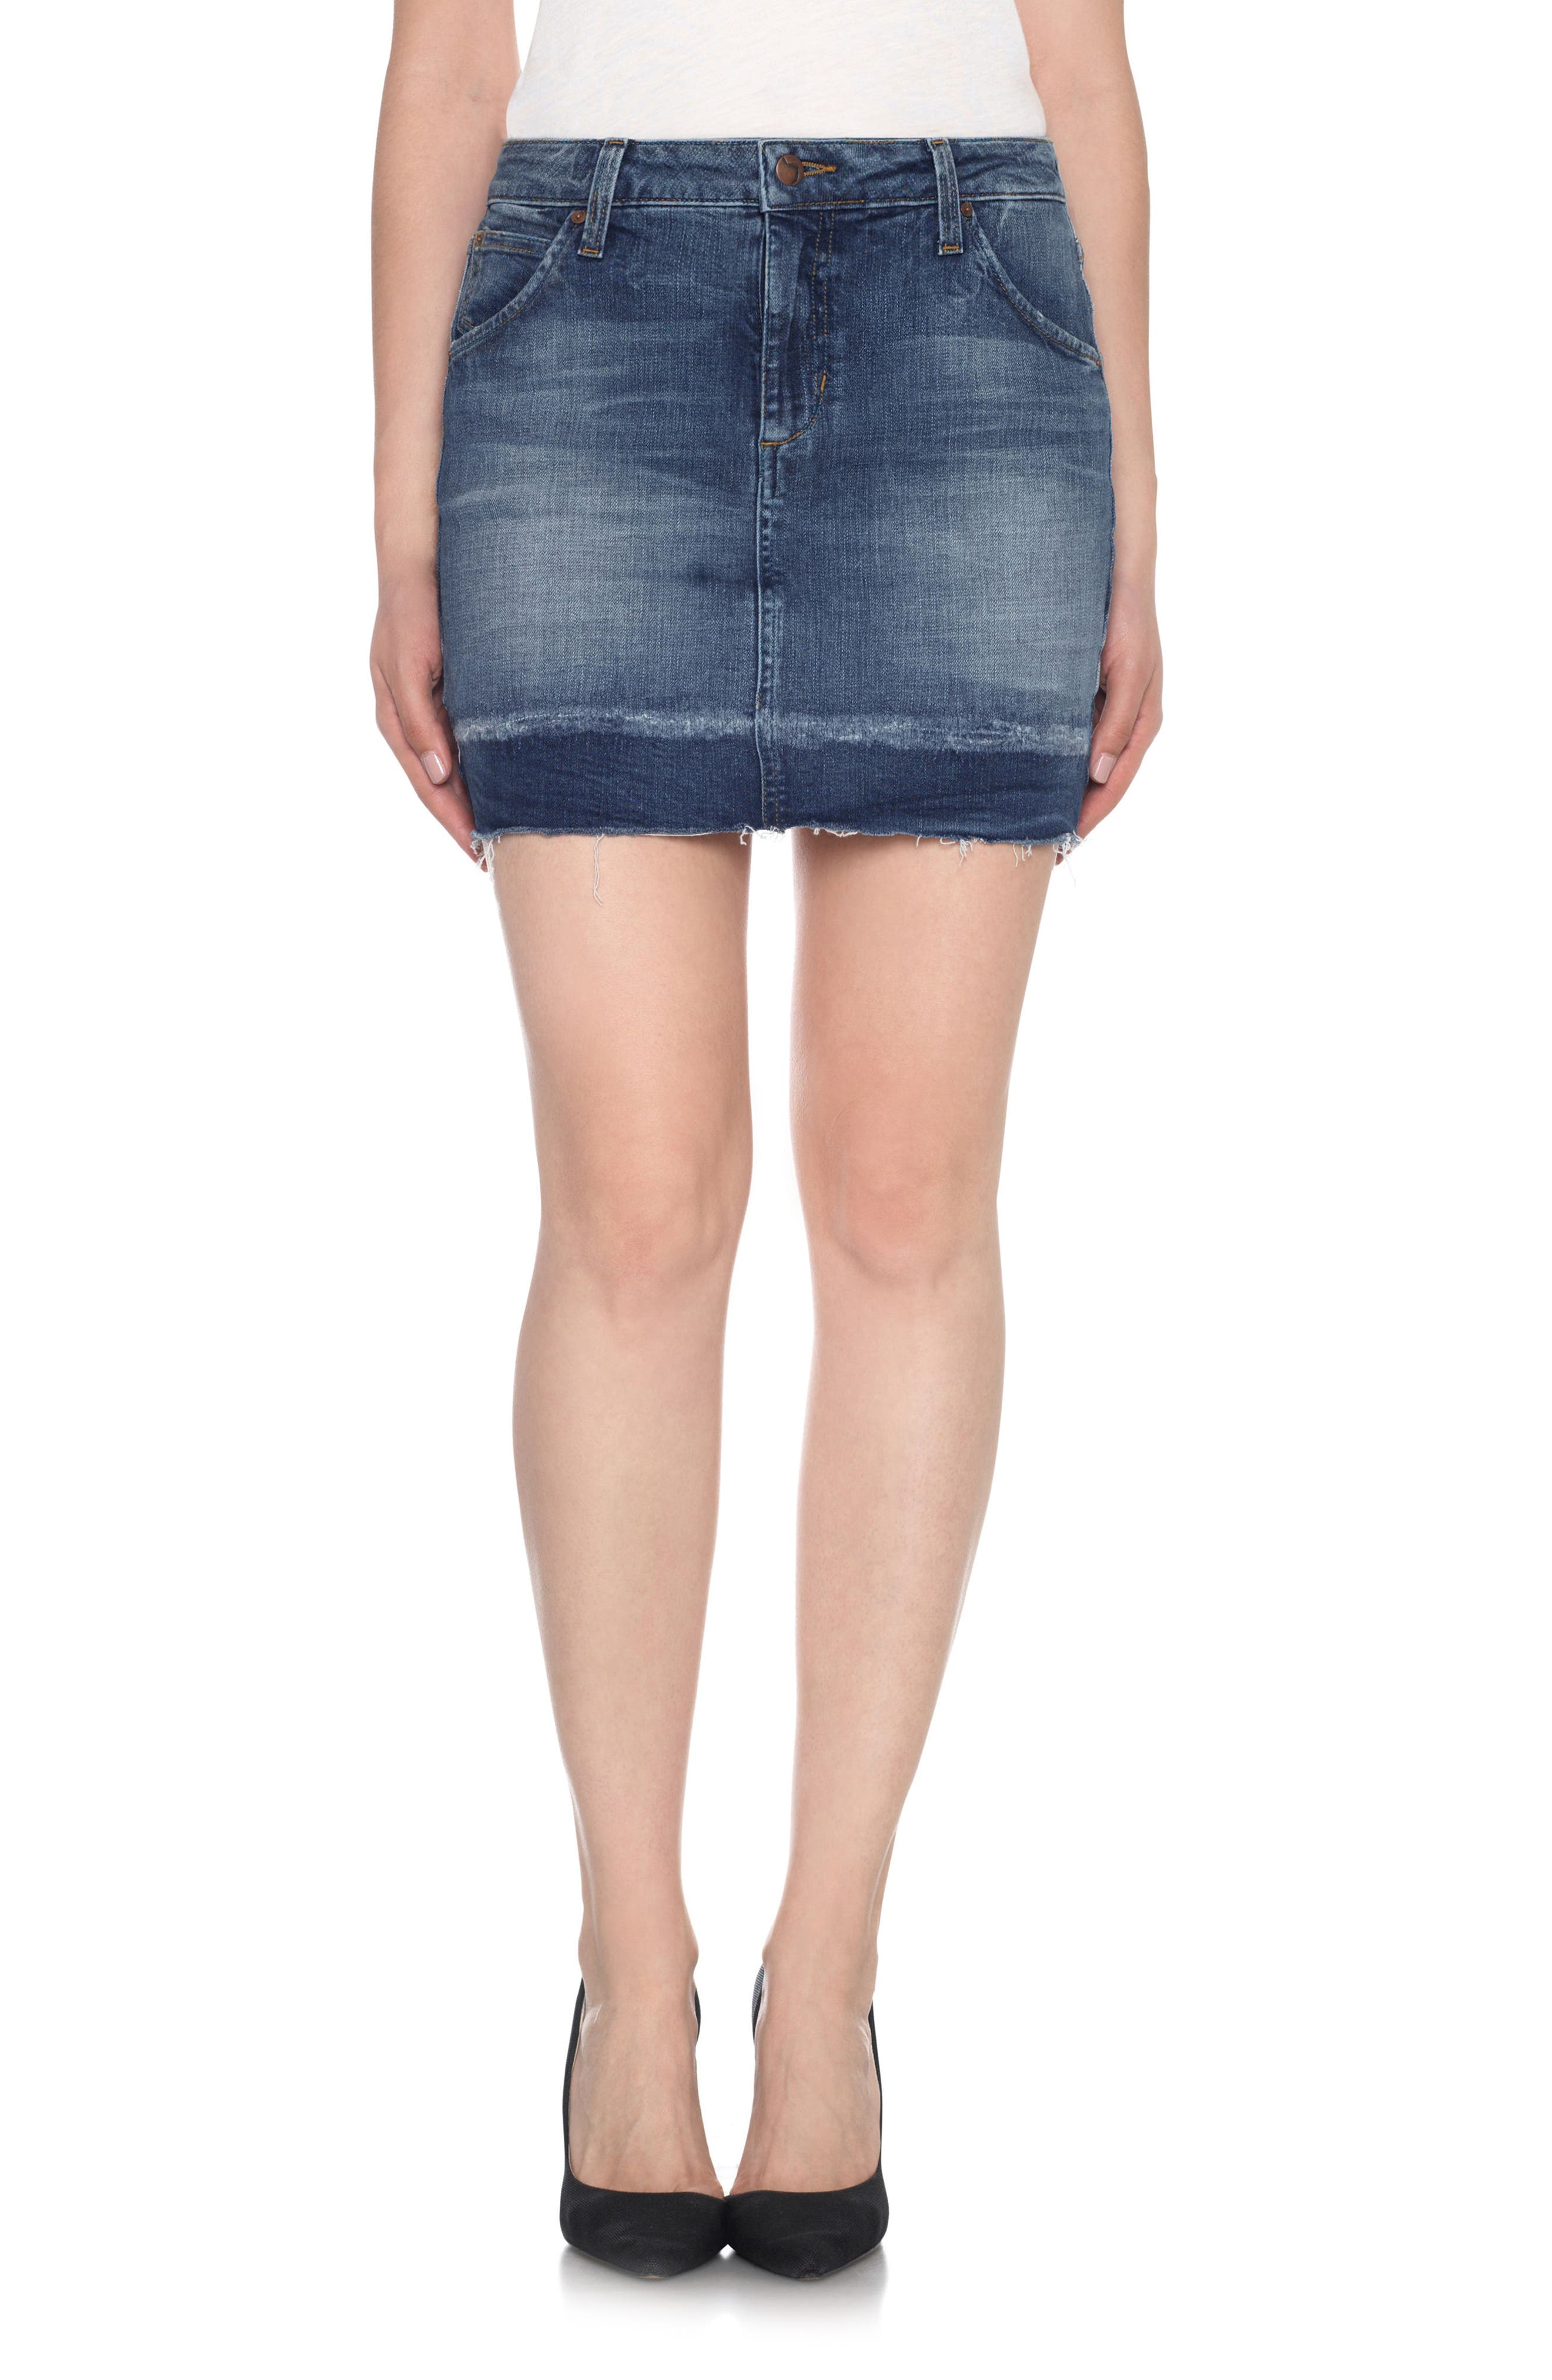 JOES Wasteland High Rise Cutoff Denim Skirt